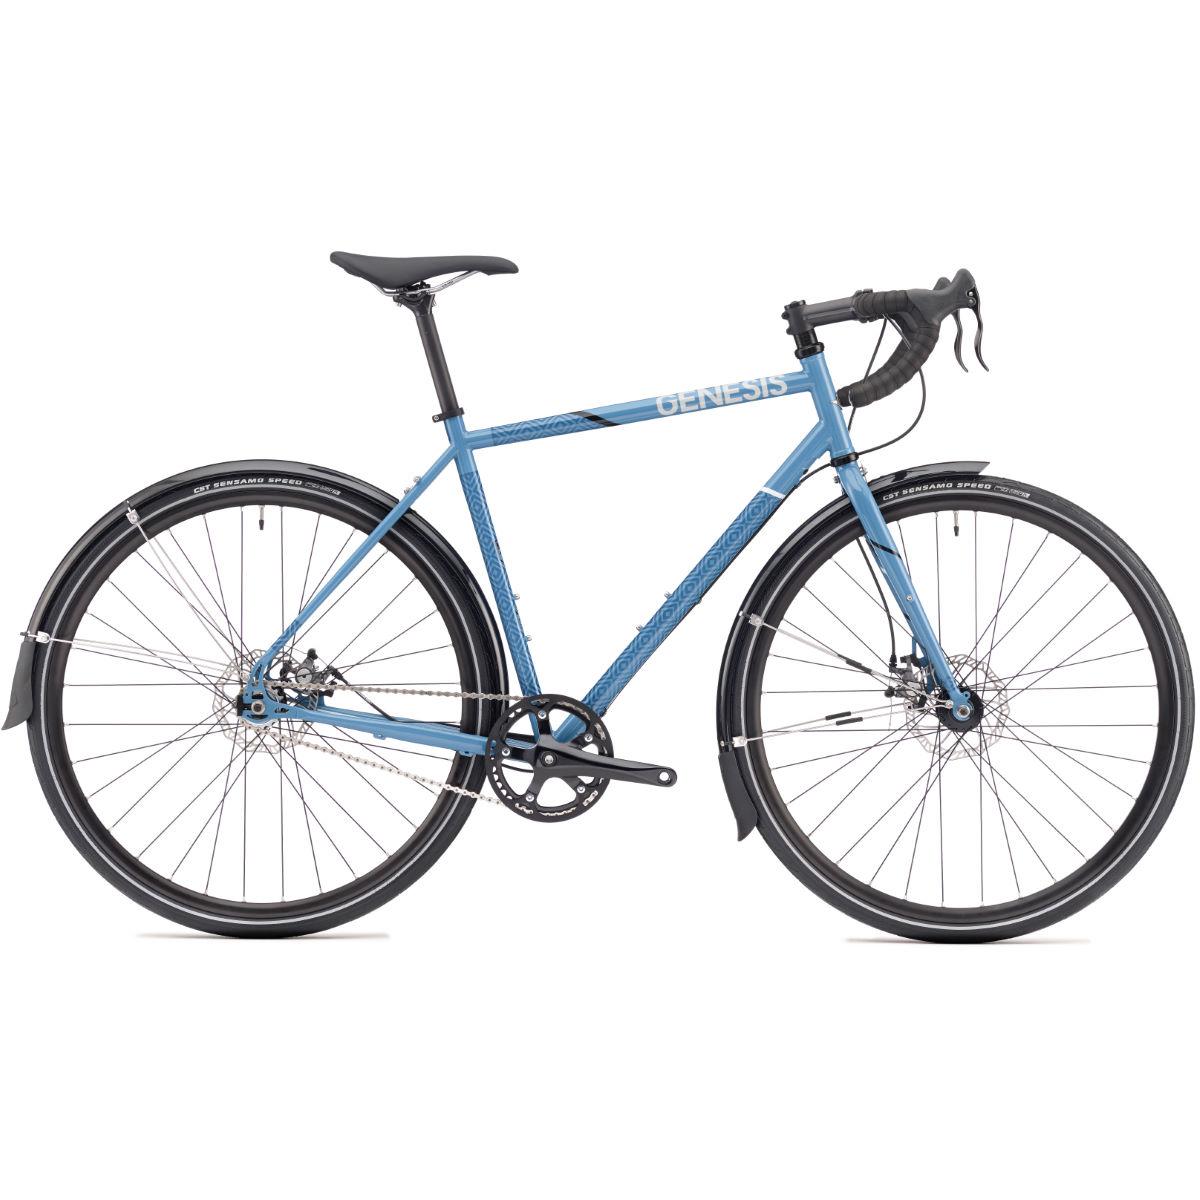 Genesis Day One 10 Utility 2018 Single Speed Bikes